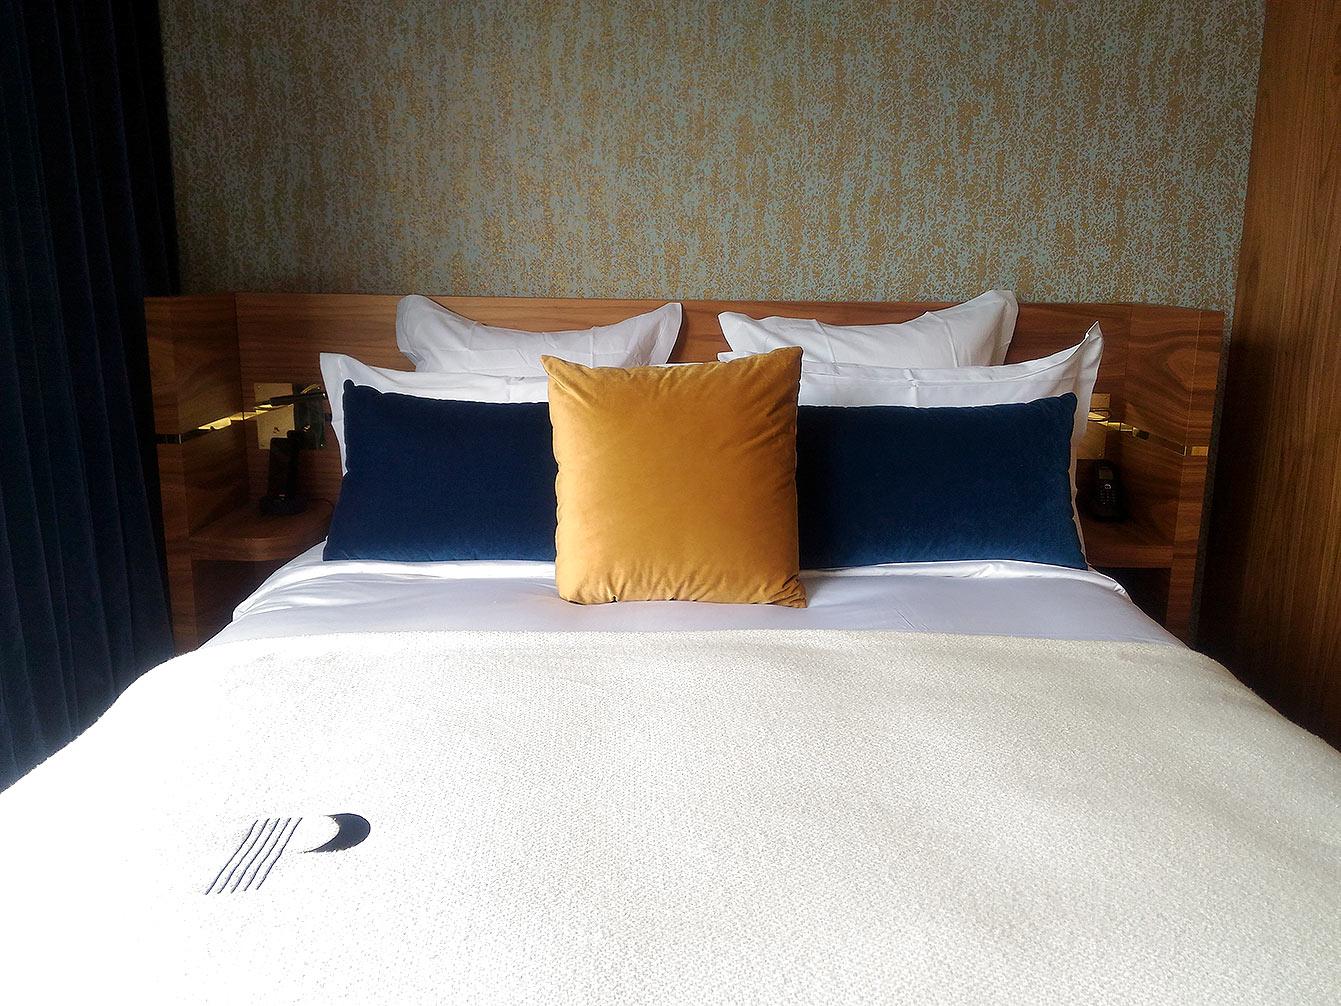 05-hotel-parister